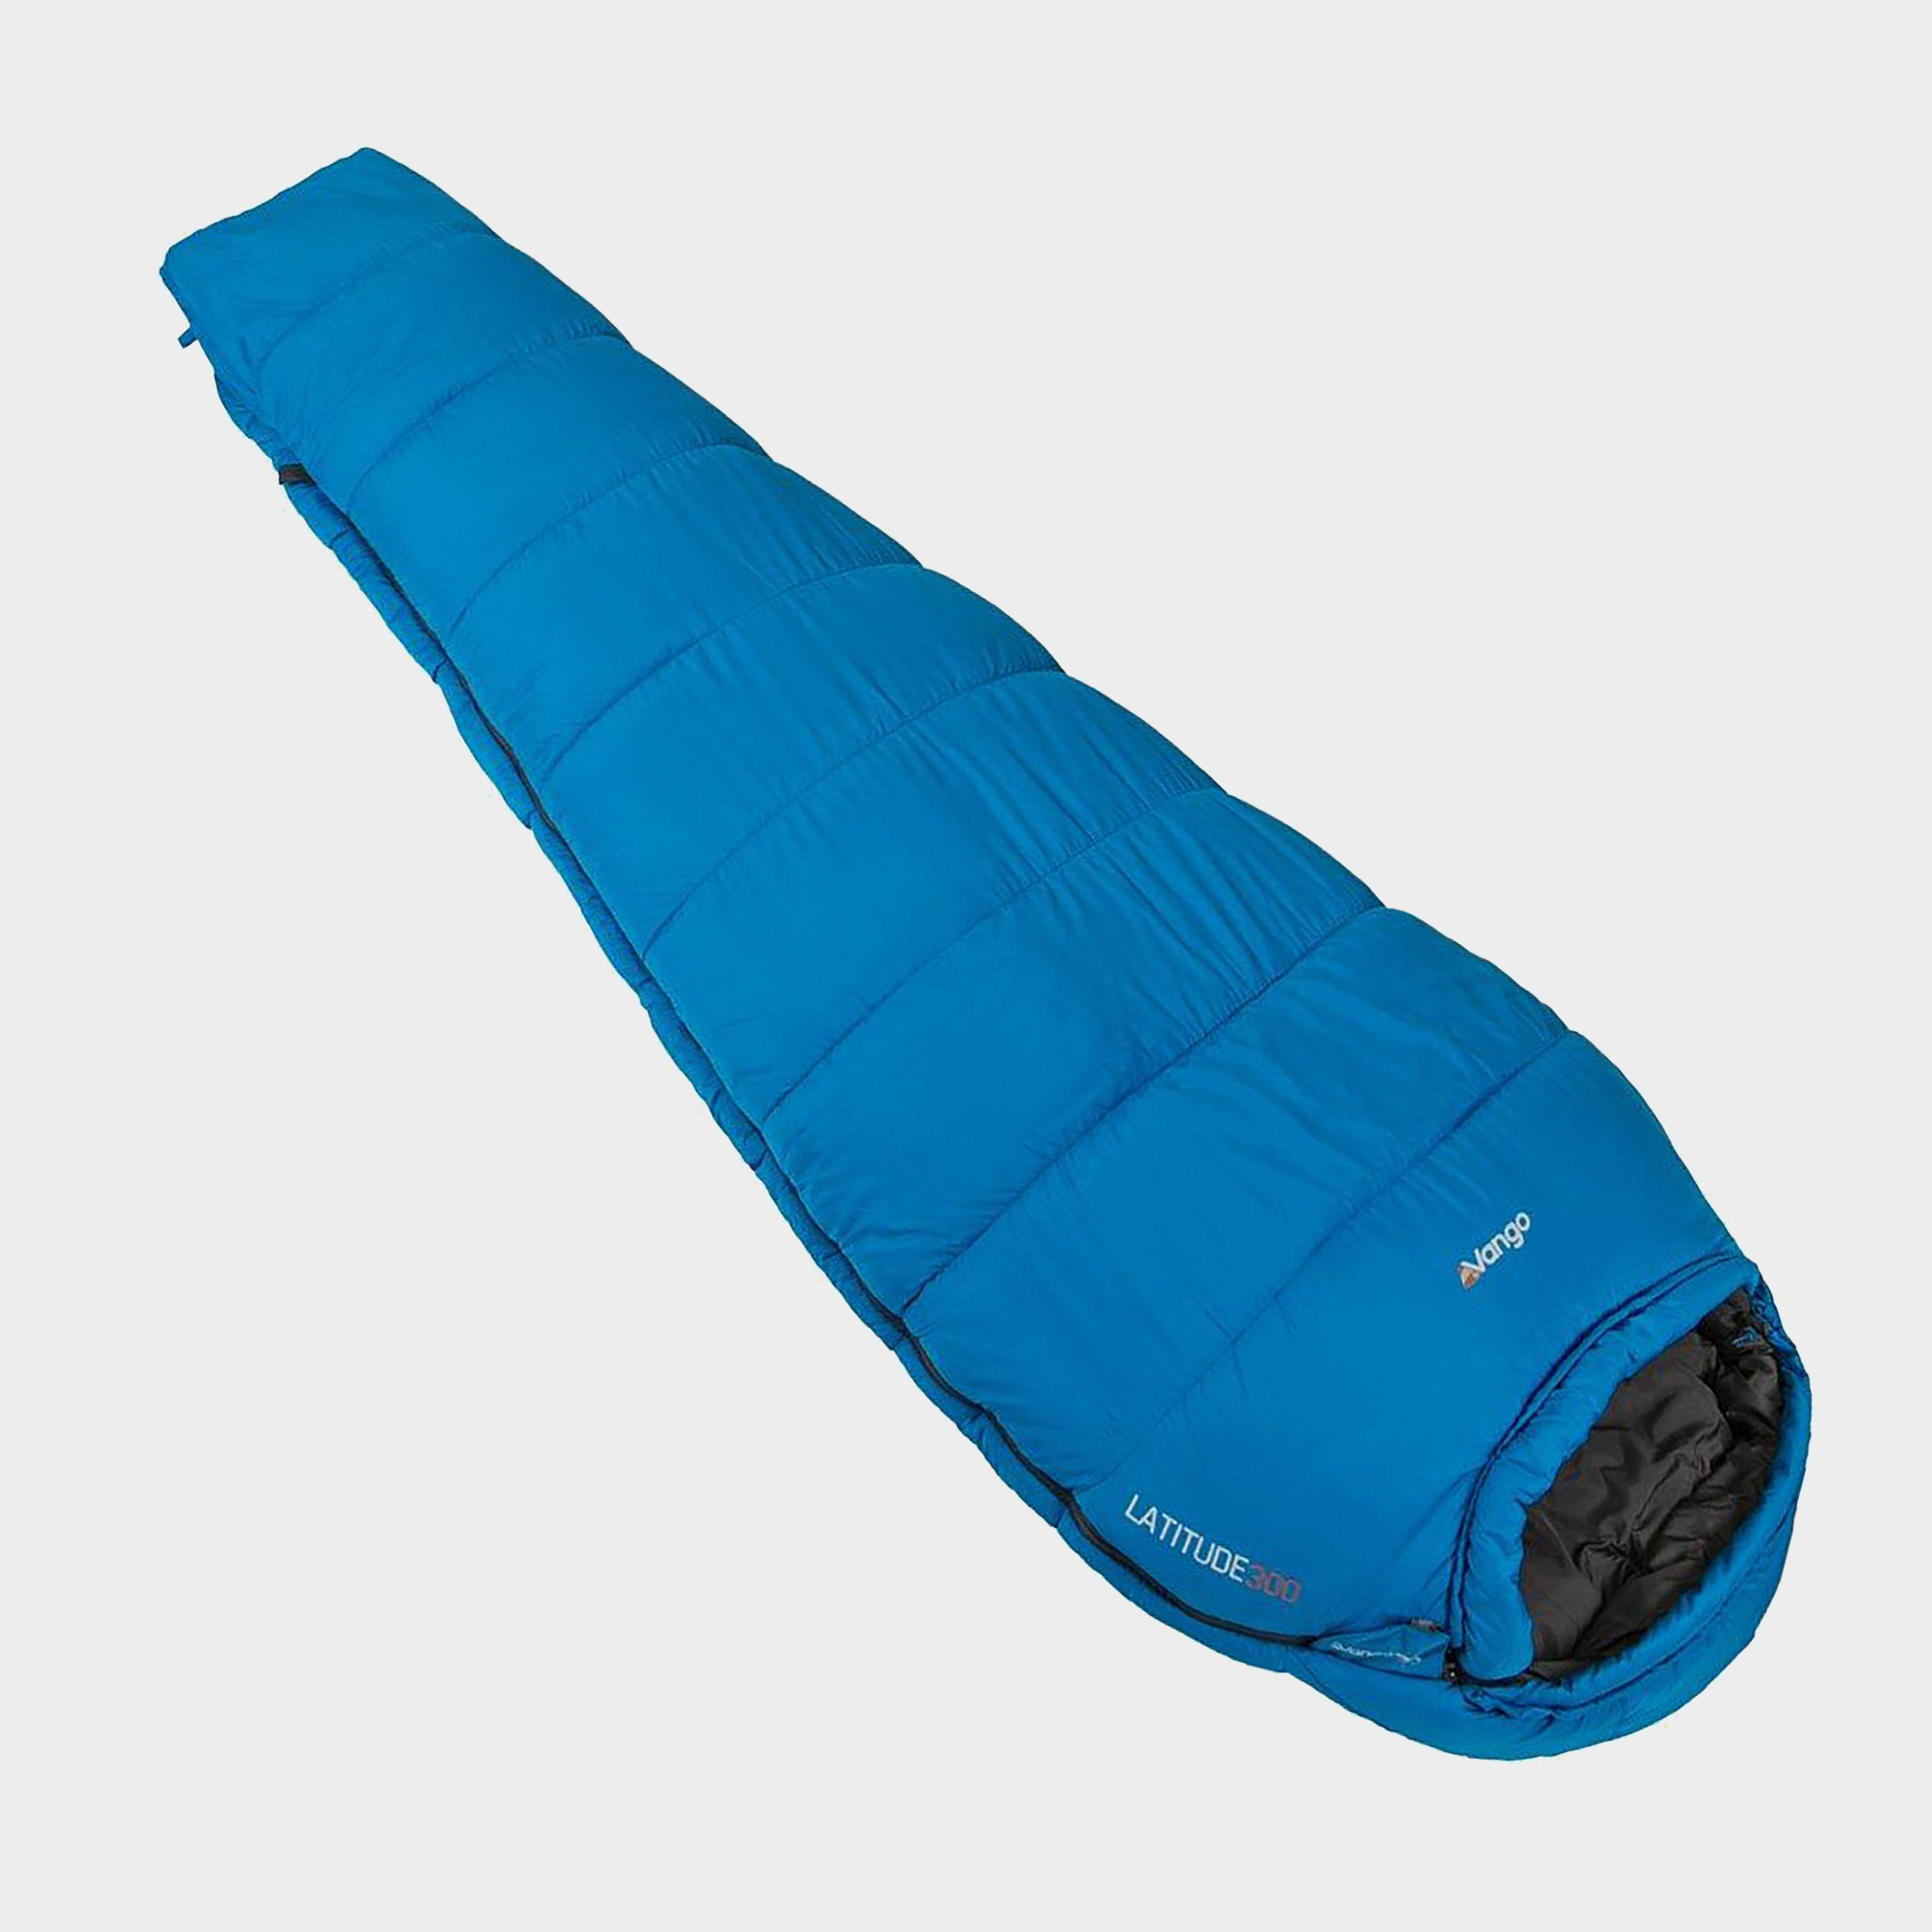 Vango Latitude 300 34 Season Sleeping Bag  Blue Blue